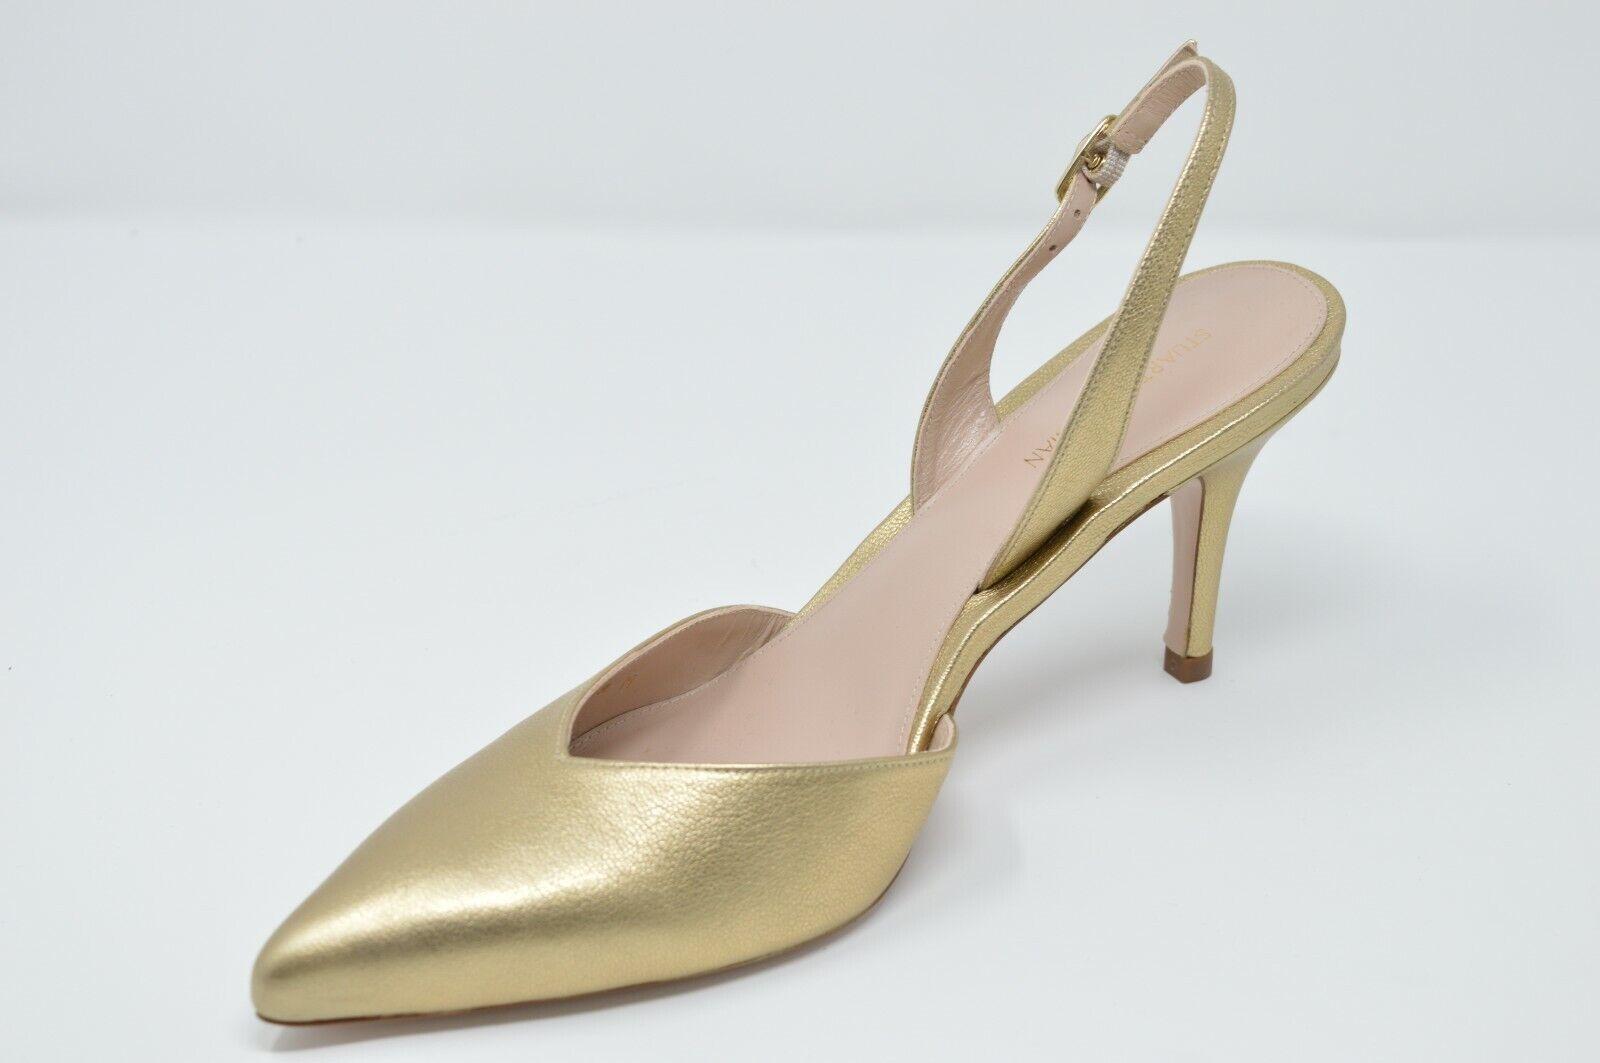 prendiamo i clienti come nostro dio Stuart Weitzman Weitzman Weitzman donna SLEEK Slingback Pumps Heels oro, Dimensione 8  vendite online